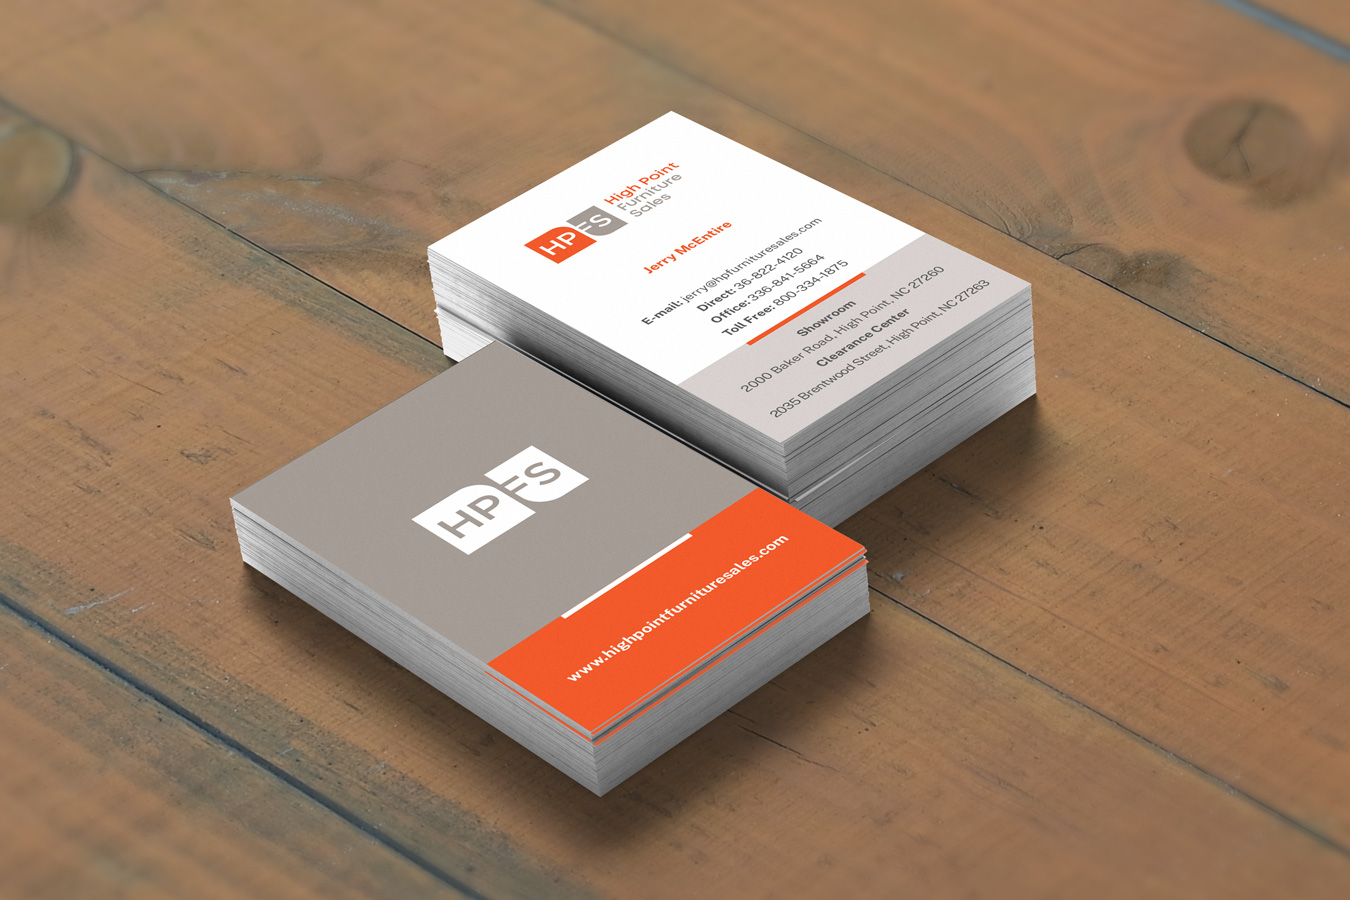 Hpfs business cards